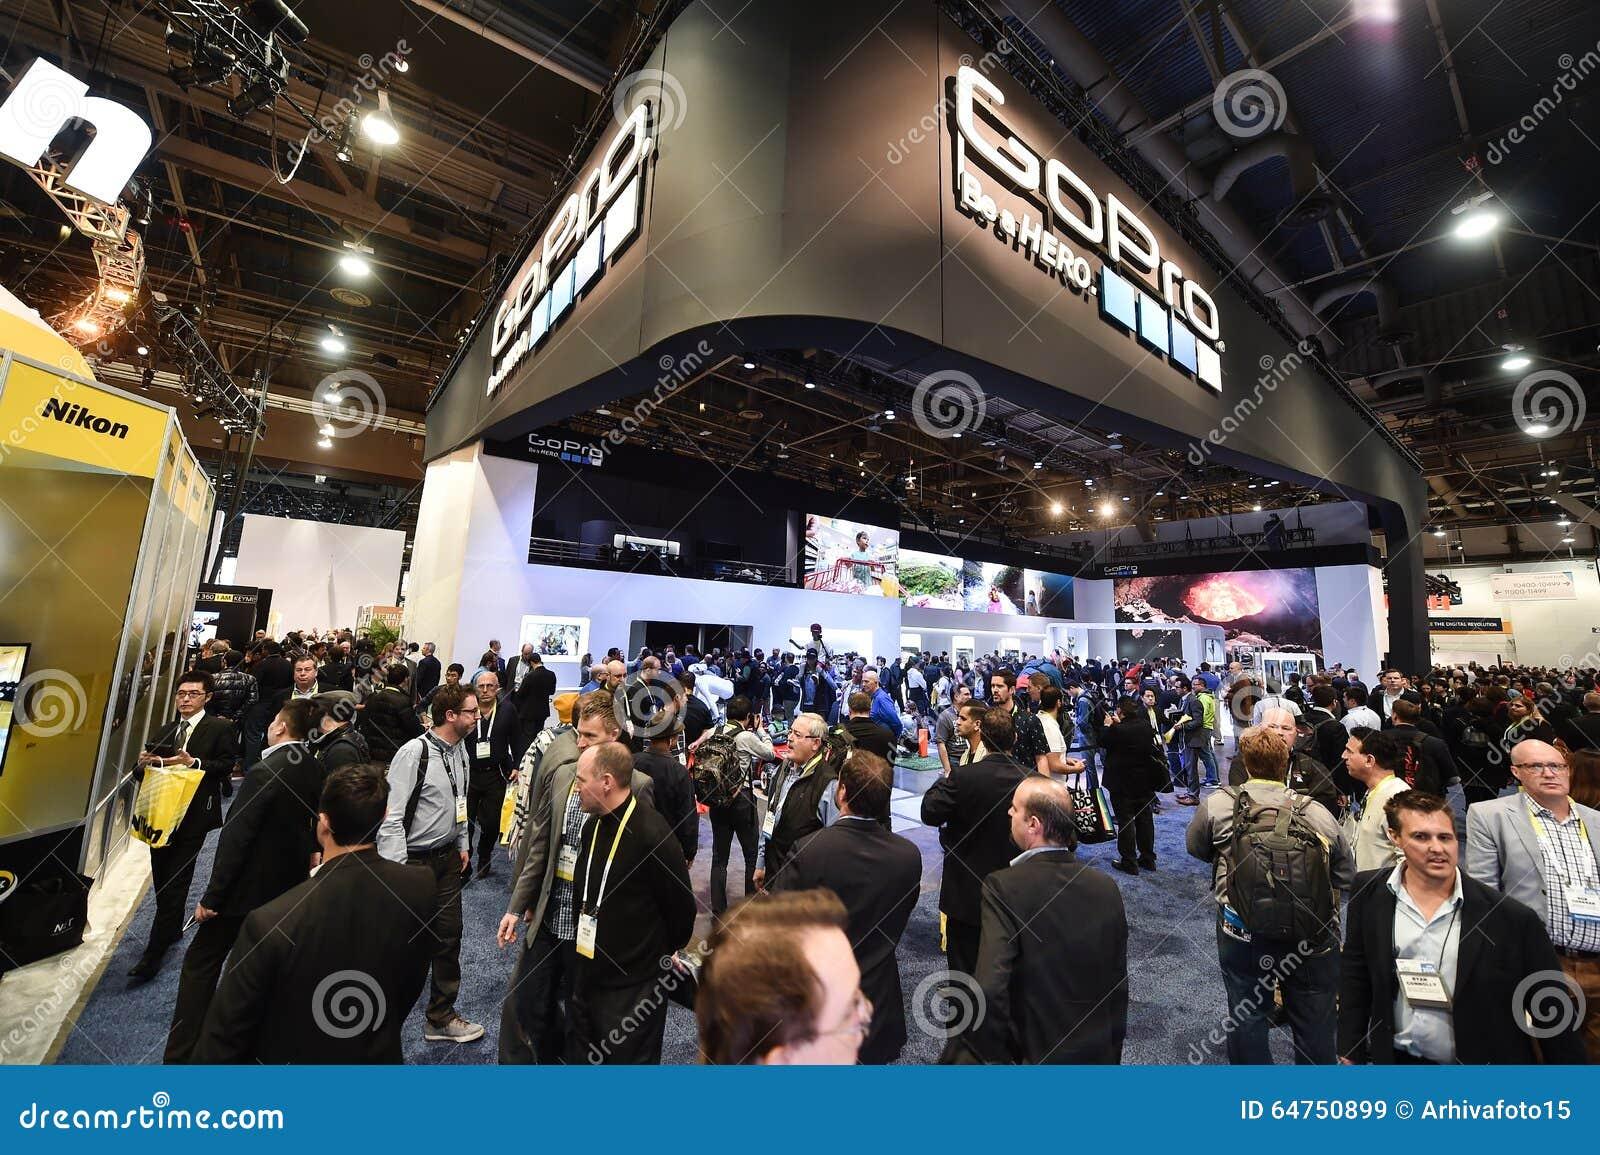 gopro at ces 2016 editorial stock image image 64750899. Black Bedroom Furniture Sets. Home Design Ideas